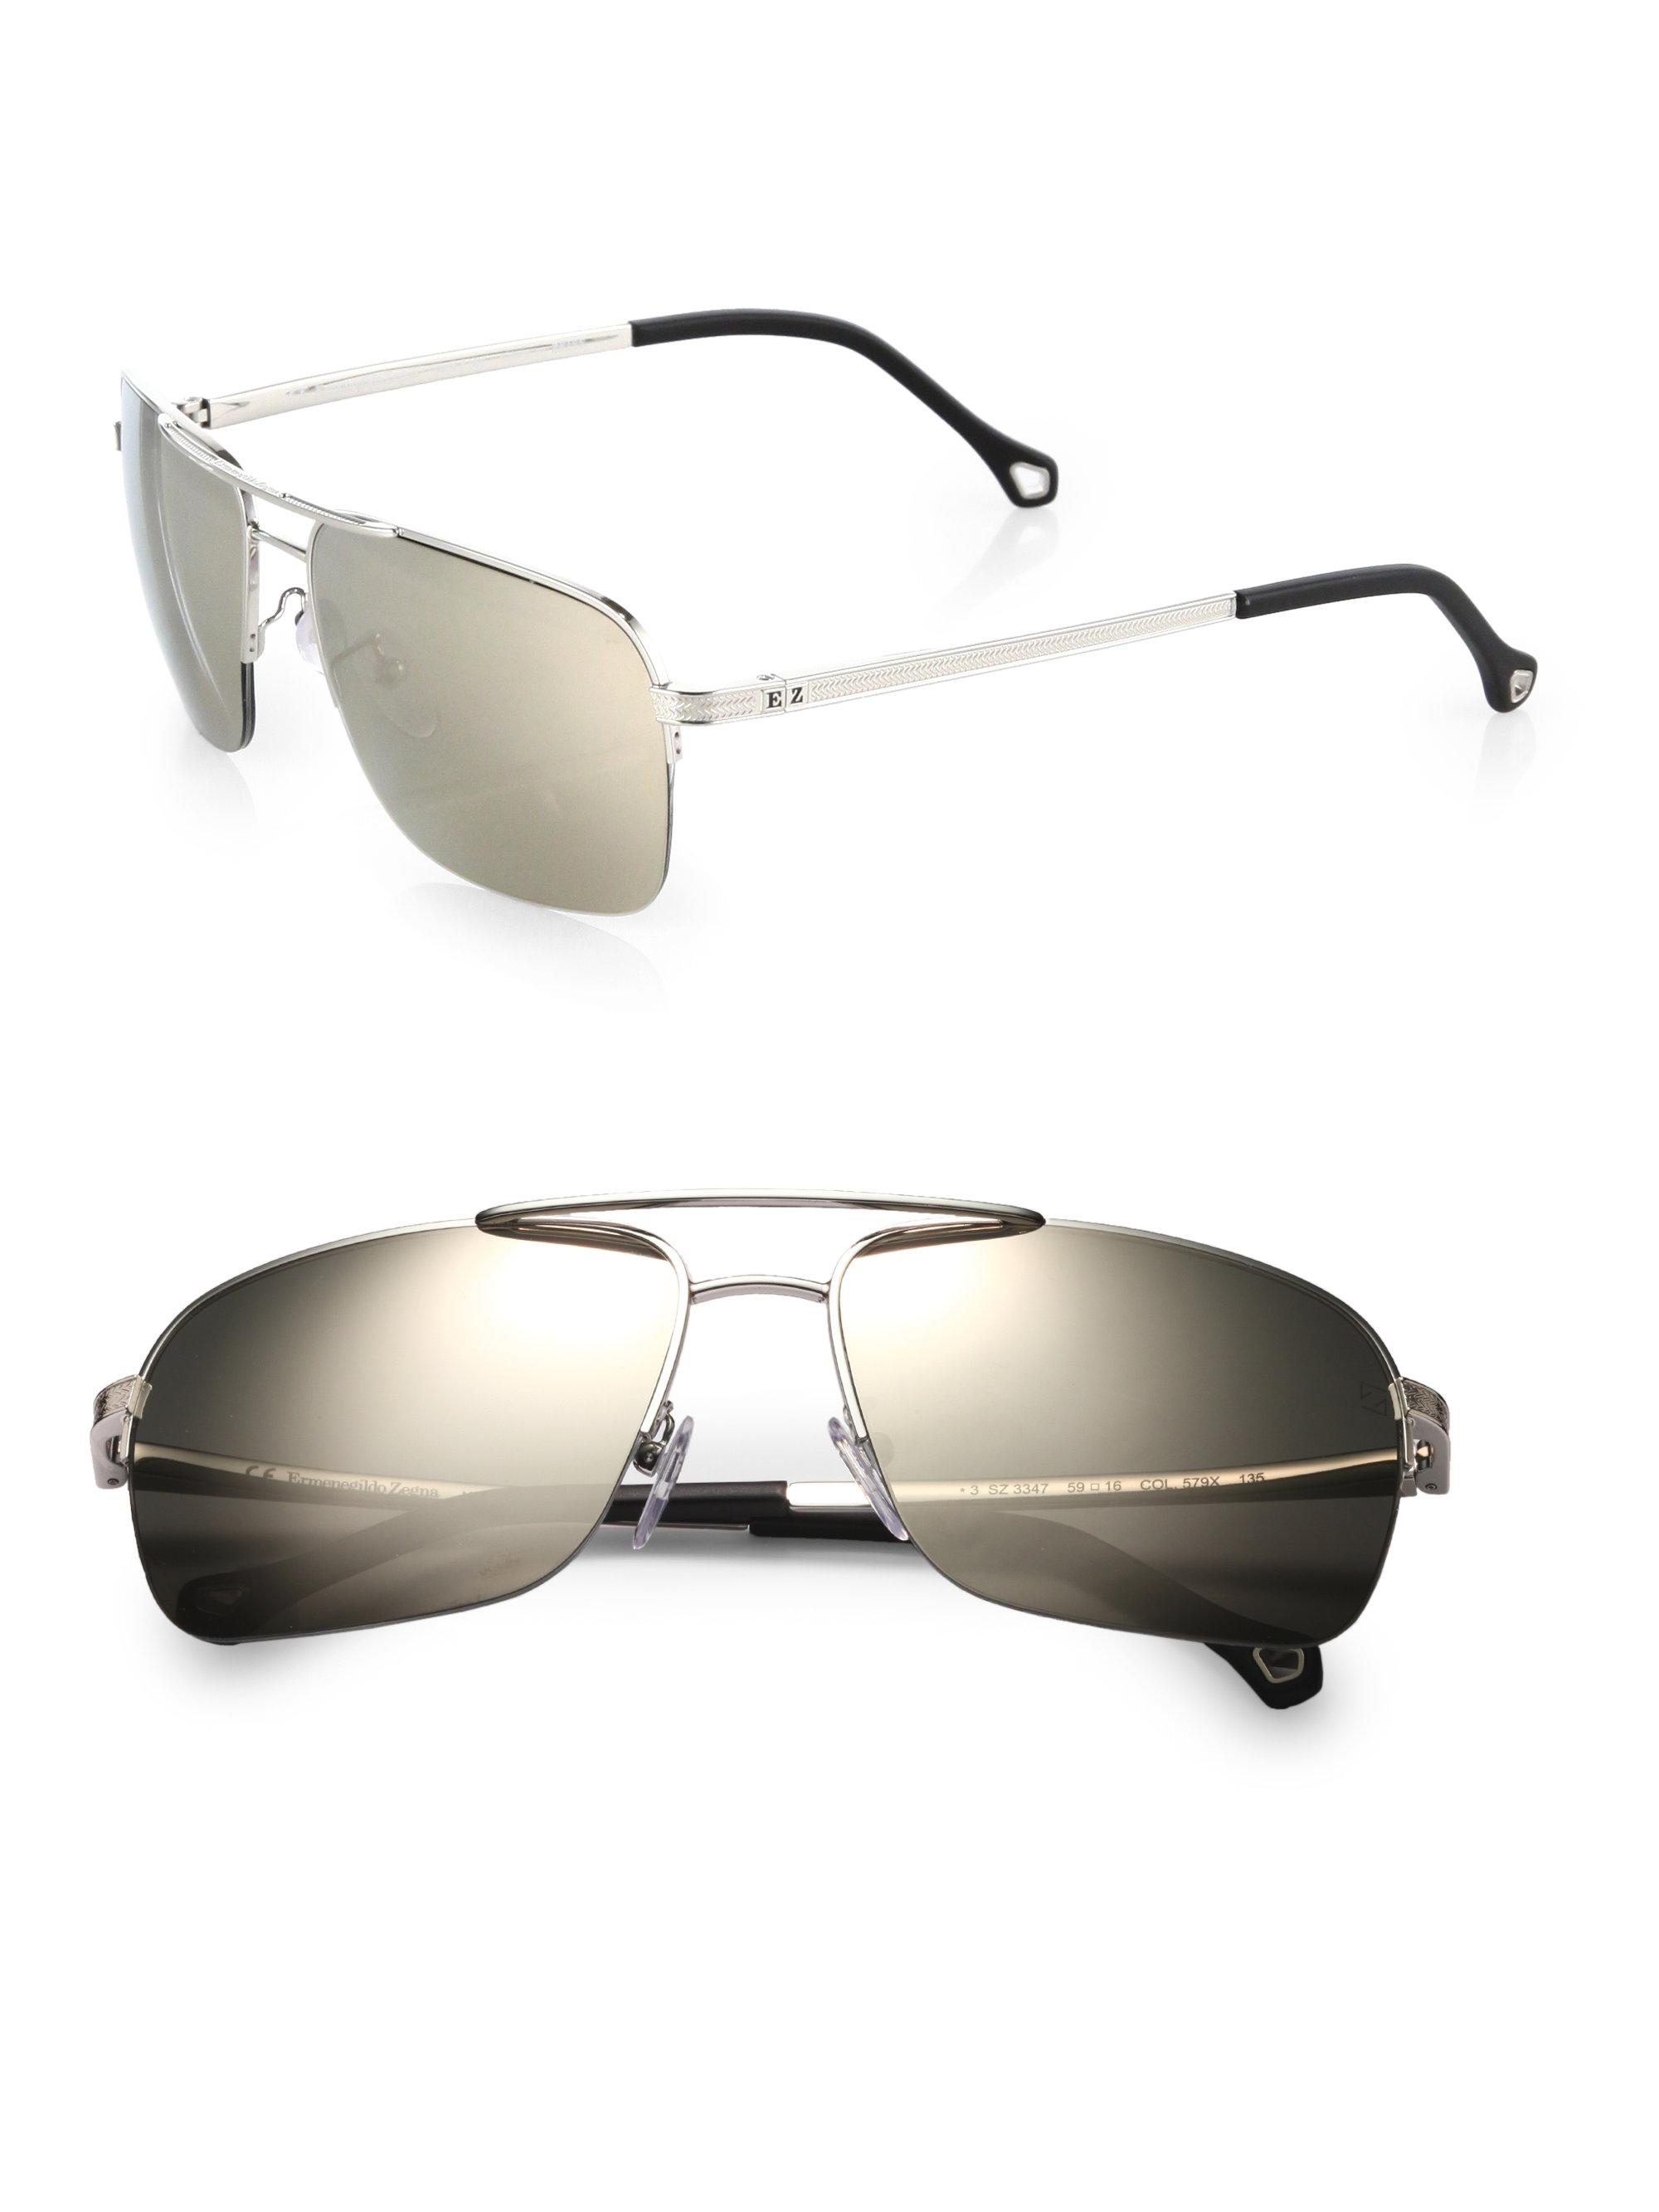 741908a584 Lyst - Ermenegildo Zegna Rimless Metal Navigator Sunglasses in Metallic for  Men